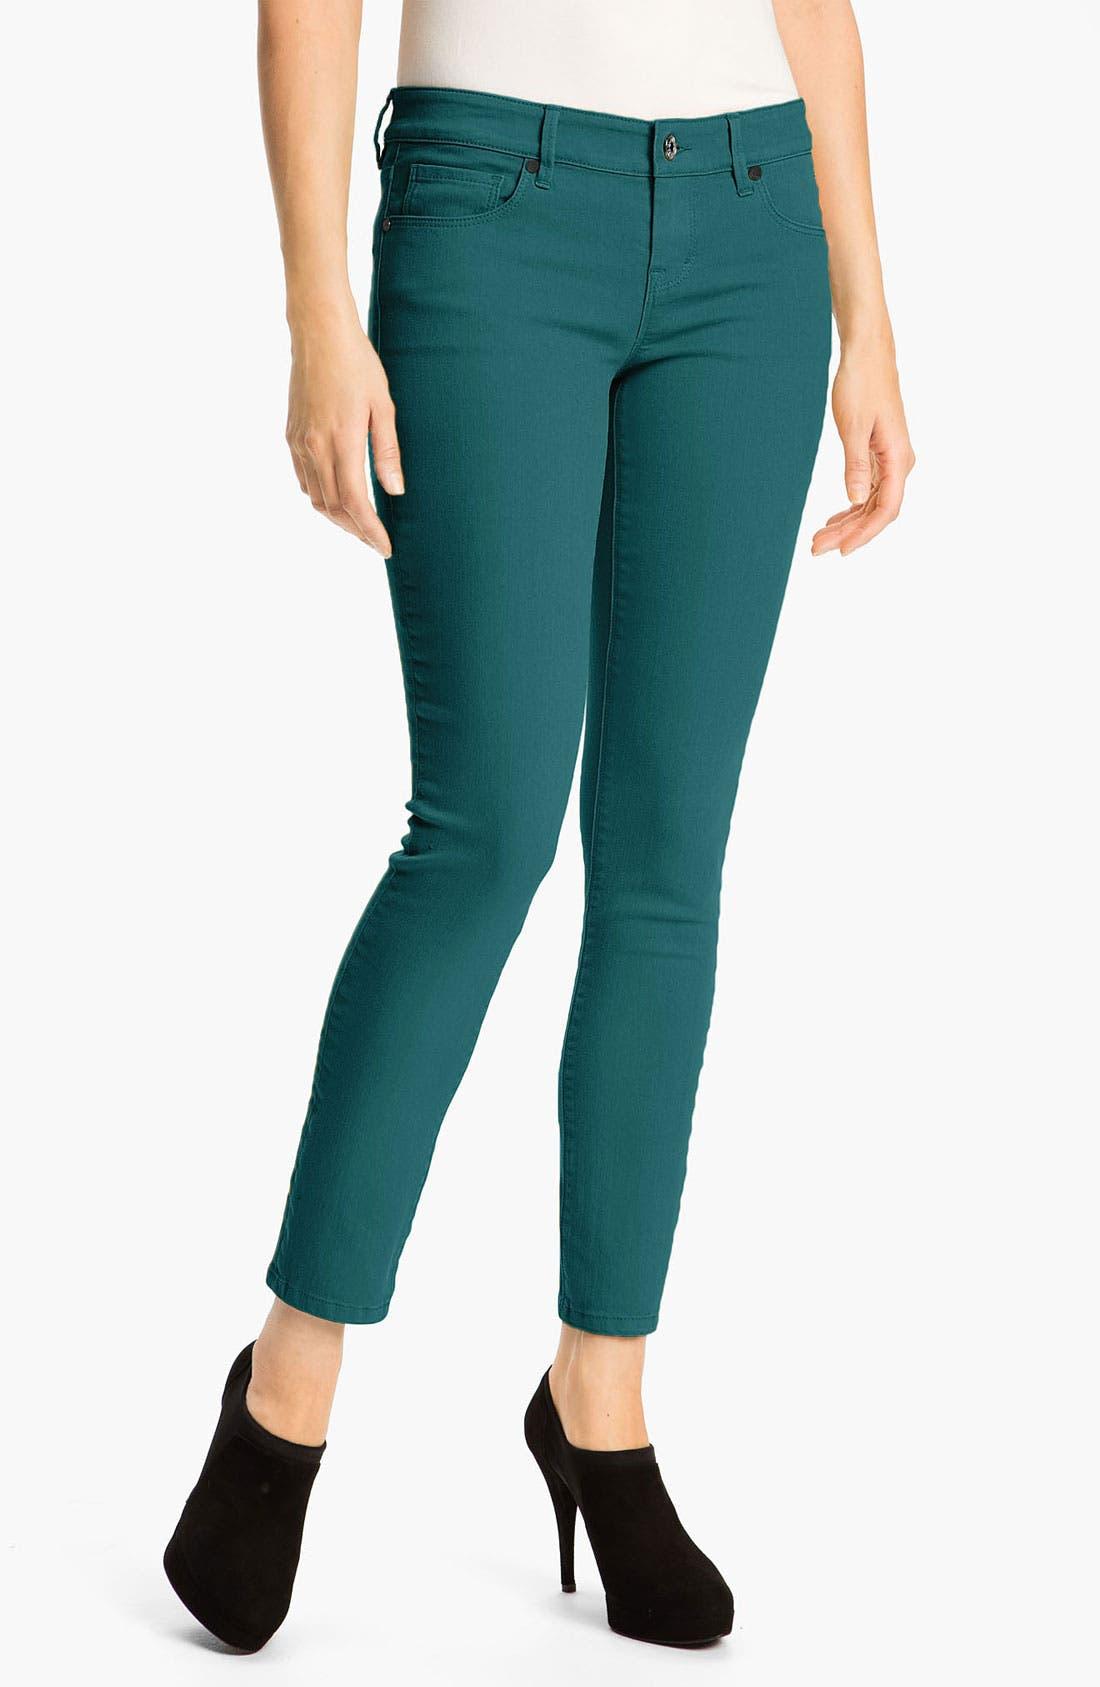 Alternate Image 1 Selected - Isaac Mizrahi Jeans 'Samantha' Colored Skinny Jeans